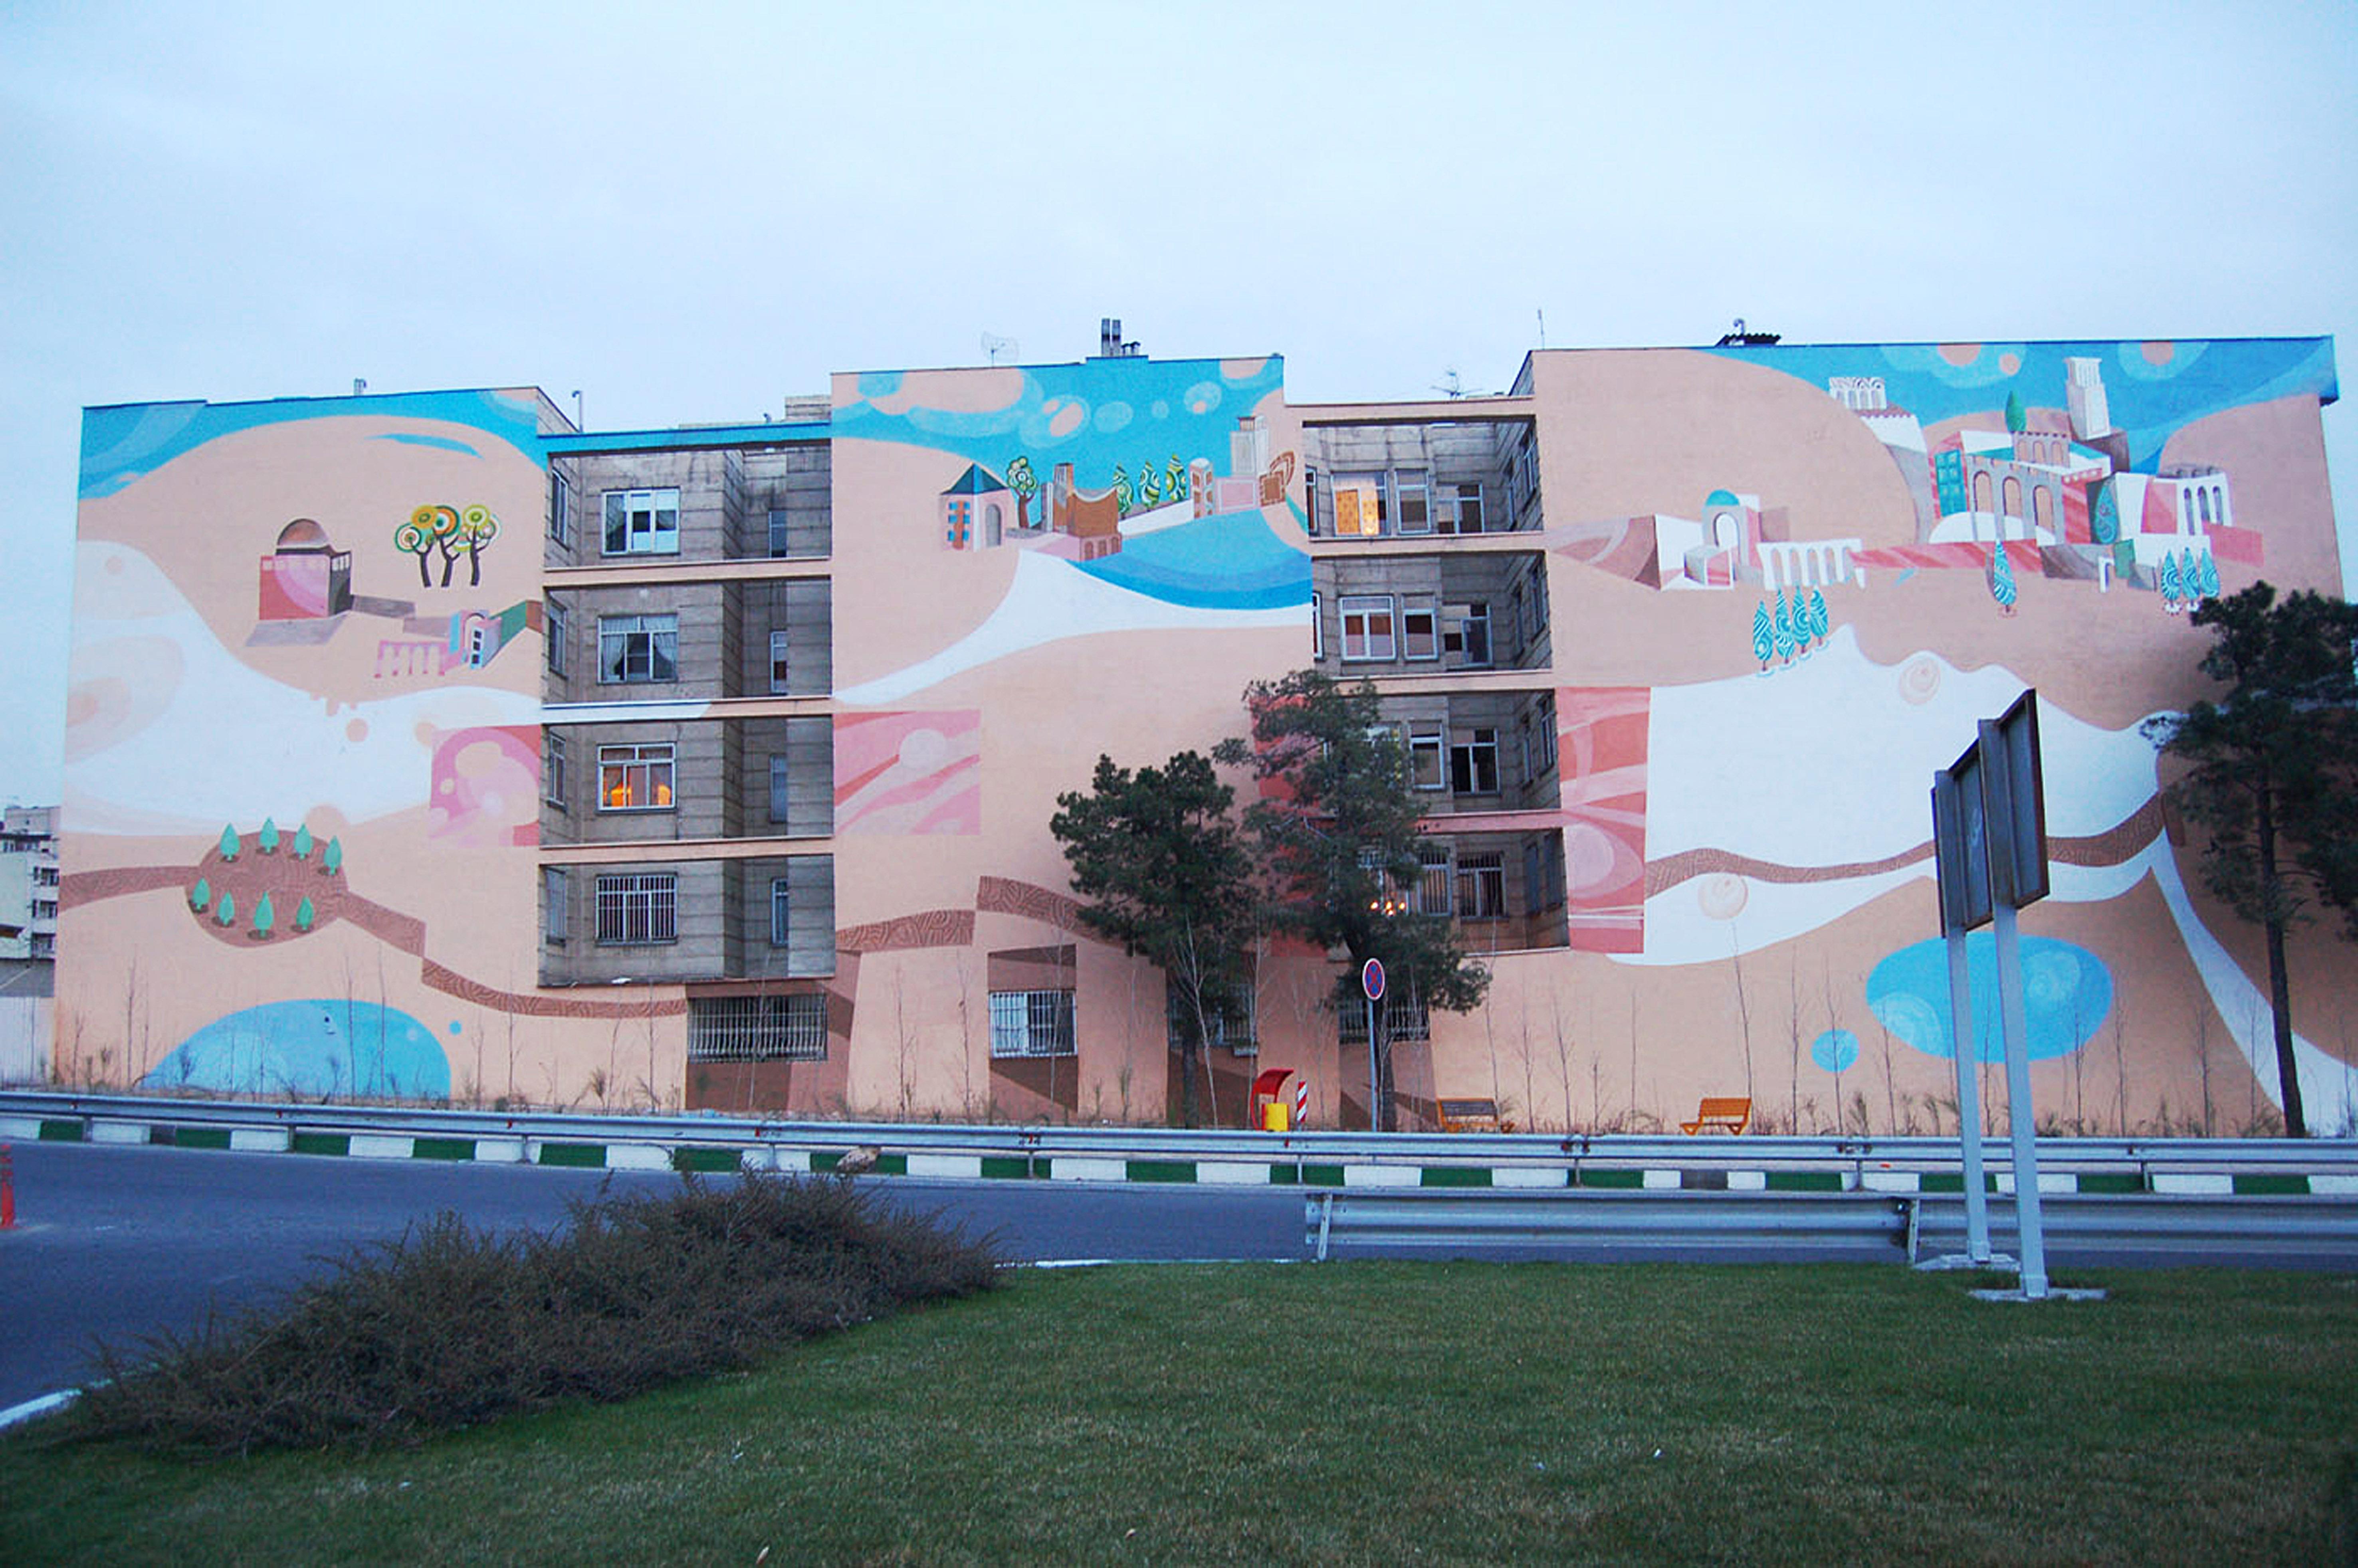 Mural, acrylic paint. Tehran 2013